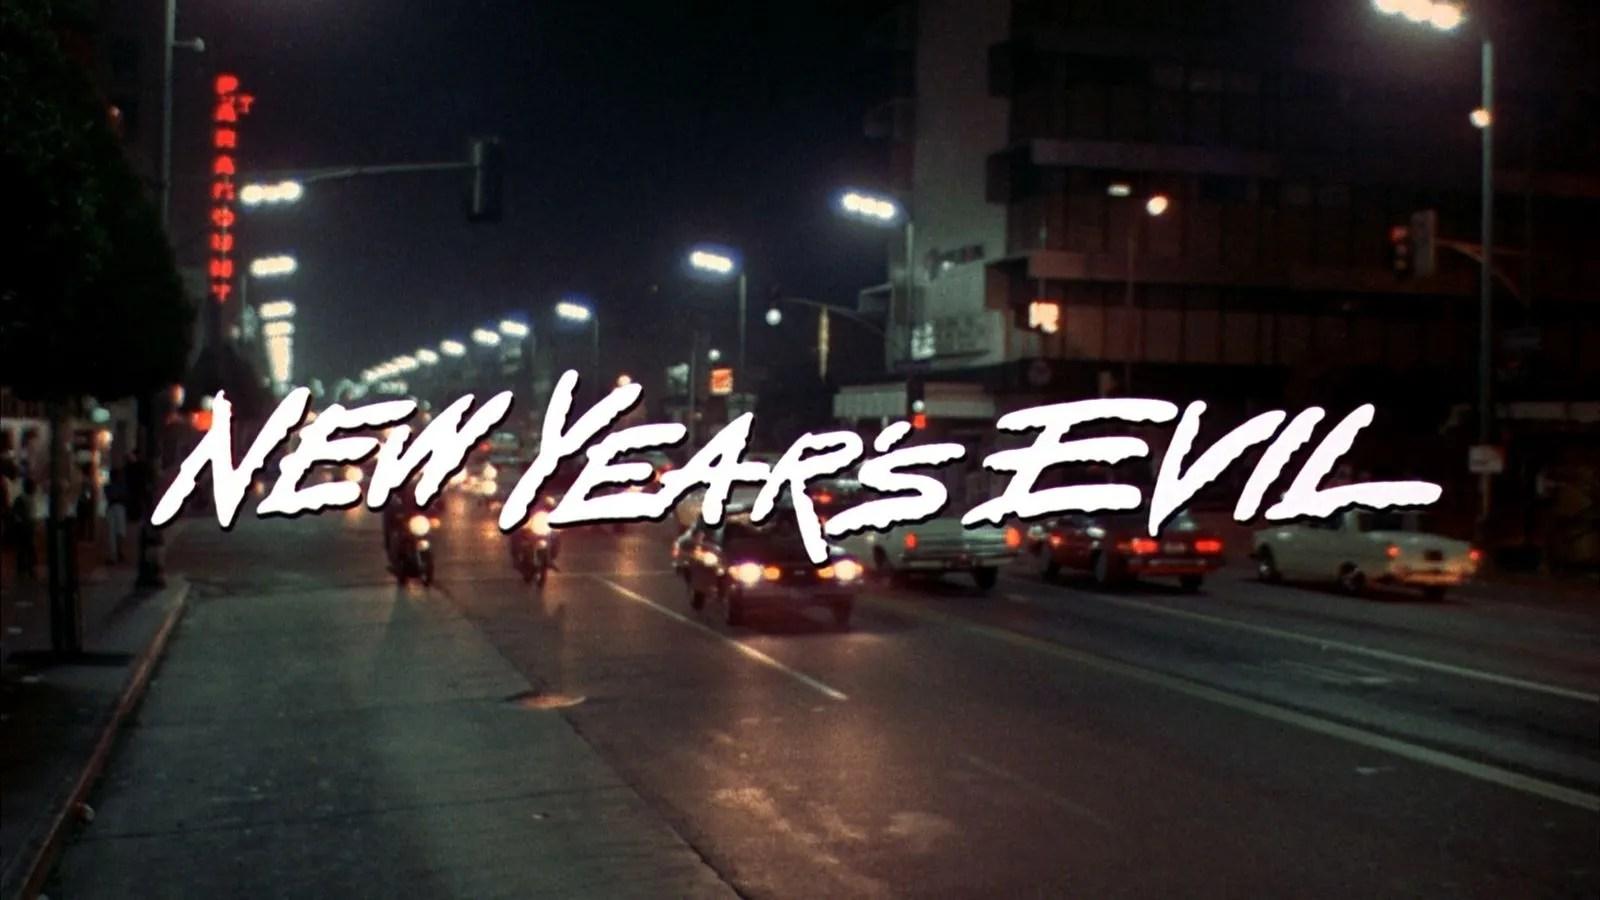 🎥 🍾 New Year's Evil (1980) FULL MOVIE 1